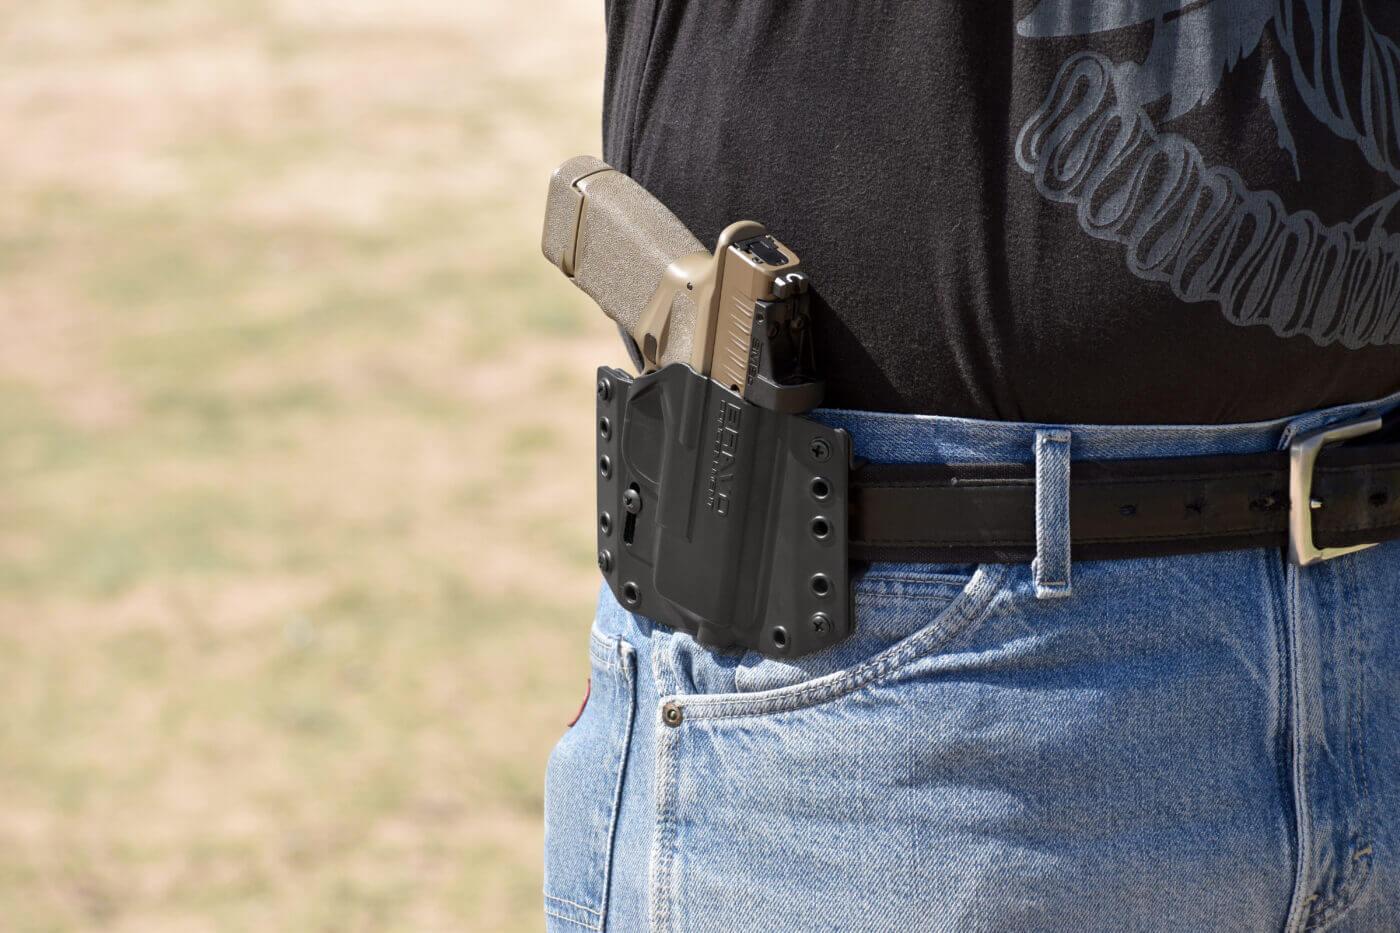 Springfield Hellcat FDE in Bravo Concealment OWB holster